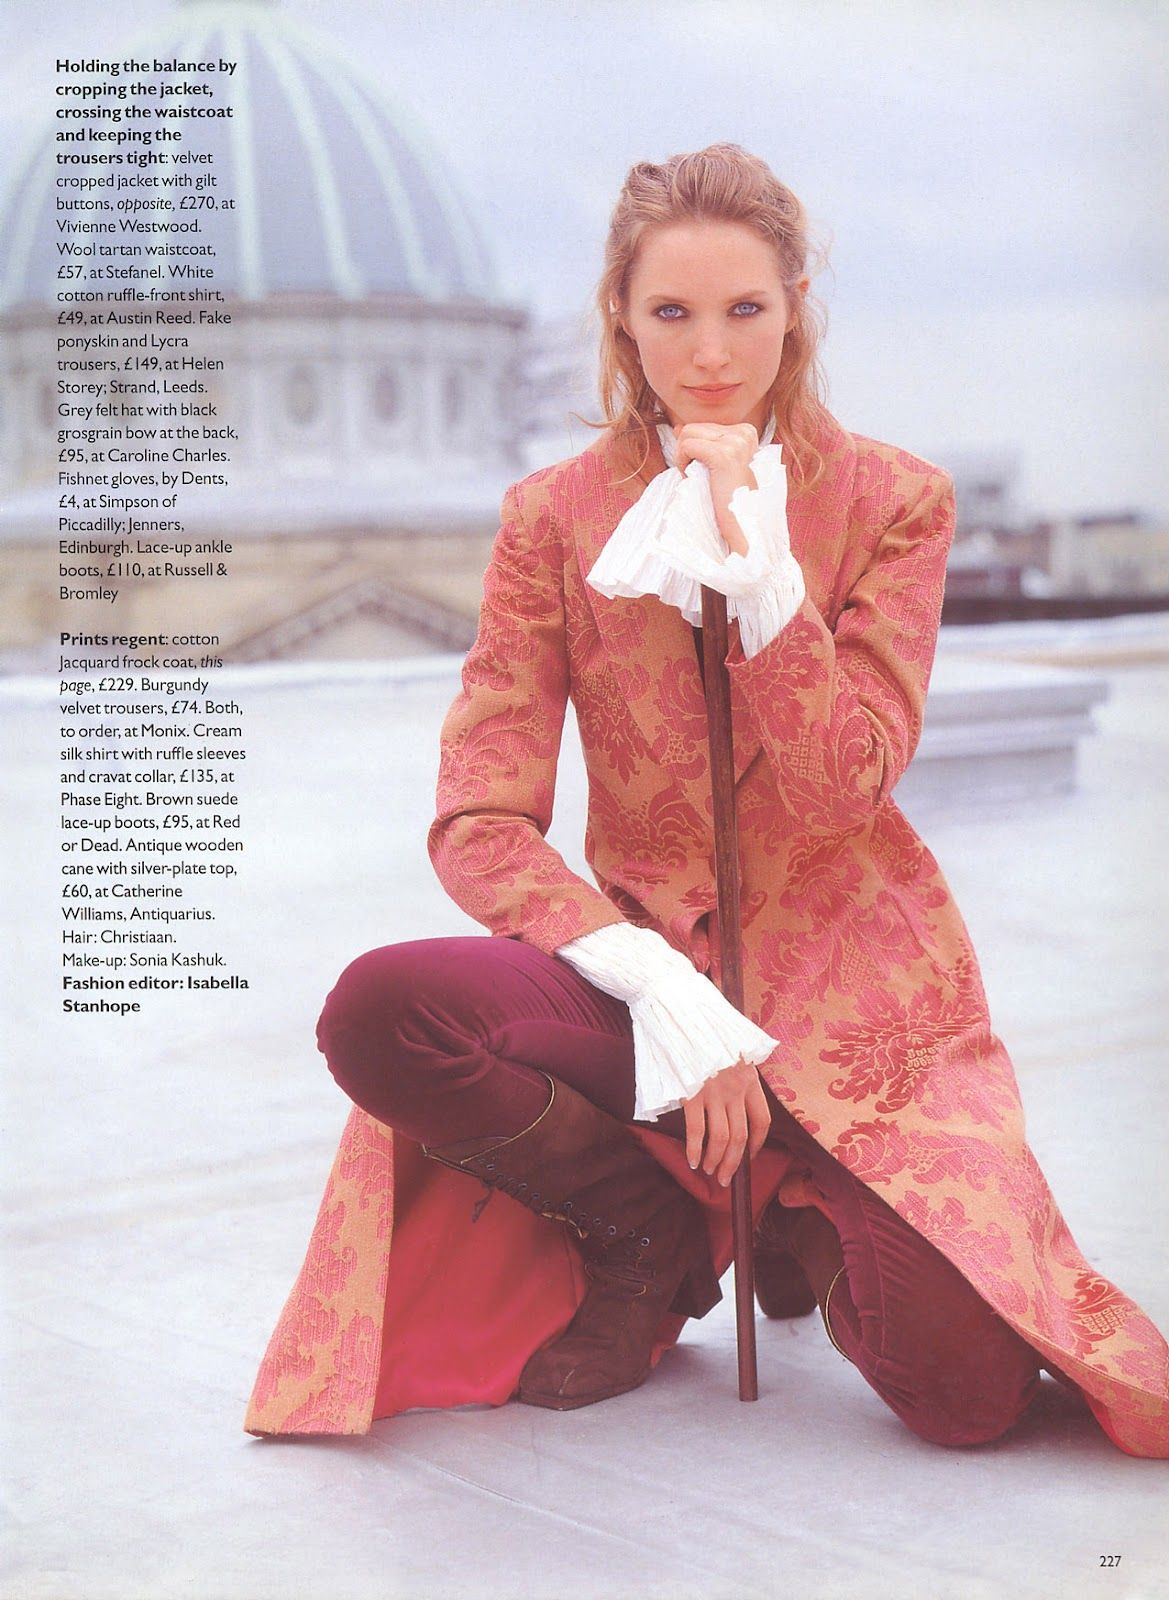 "Vogue UK October 1993 ""Artful Dodgers"" Model: Christy Turlington & Cecilia Chancellor Photographer: Arthur Elgort Fashion Editor: Isabella Stanhope Hair: Christian Makeup: Sonia Kashuk"